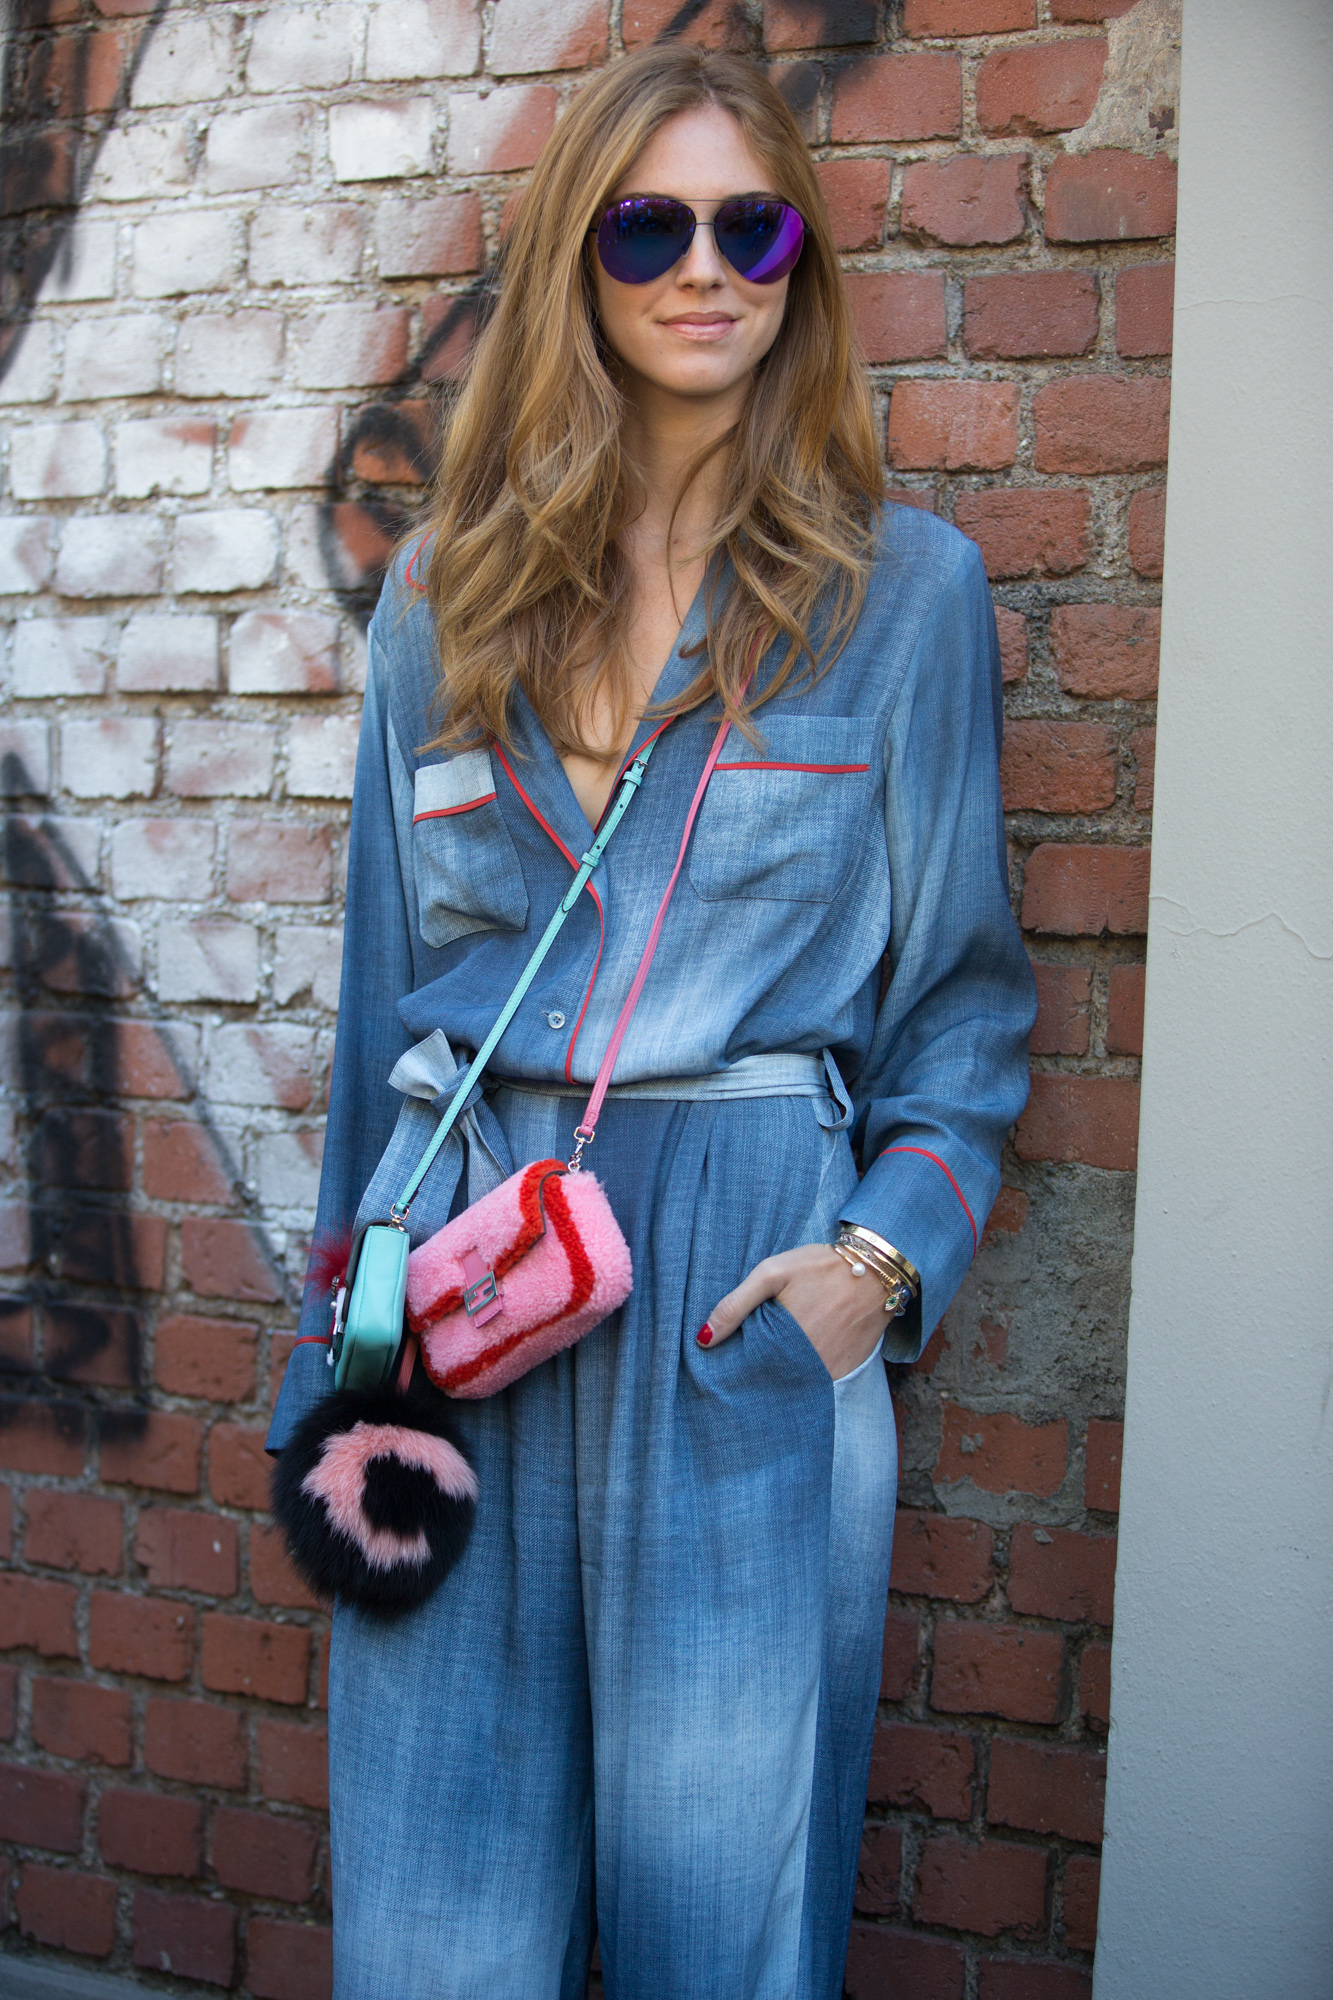 Street Style - Chiara Ferragni